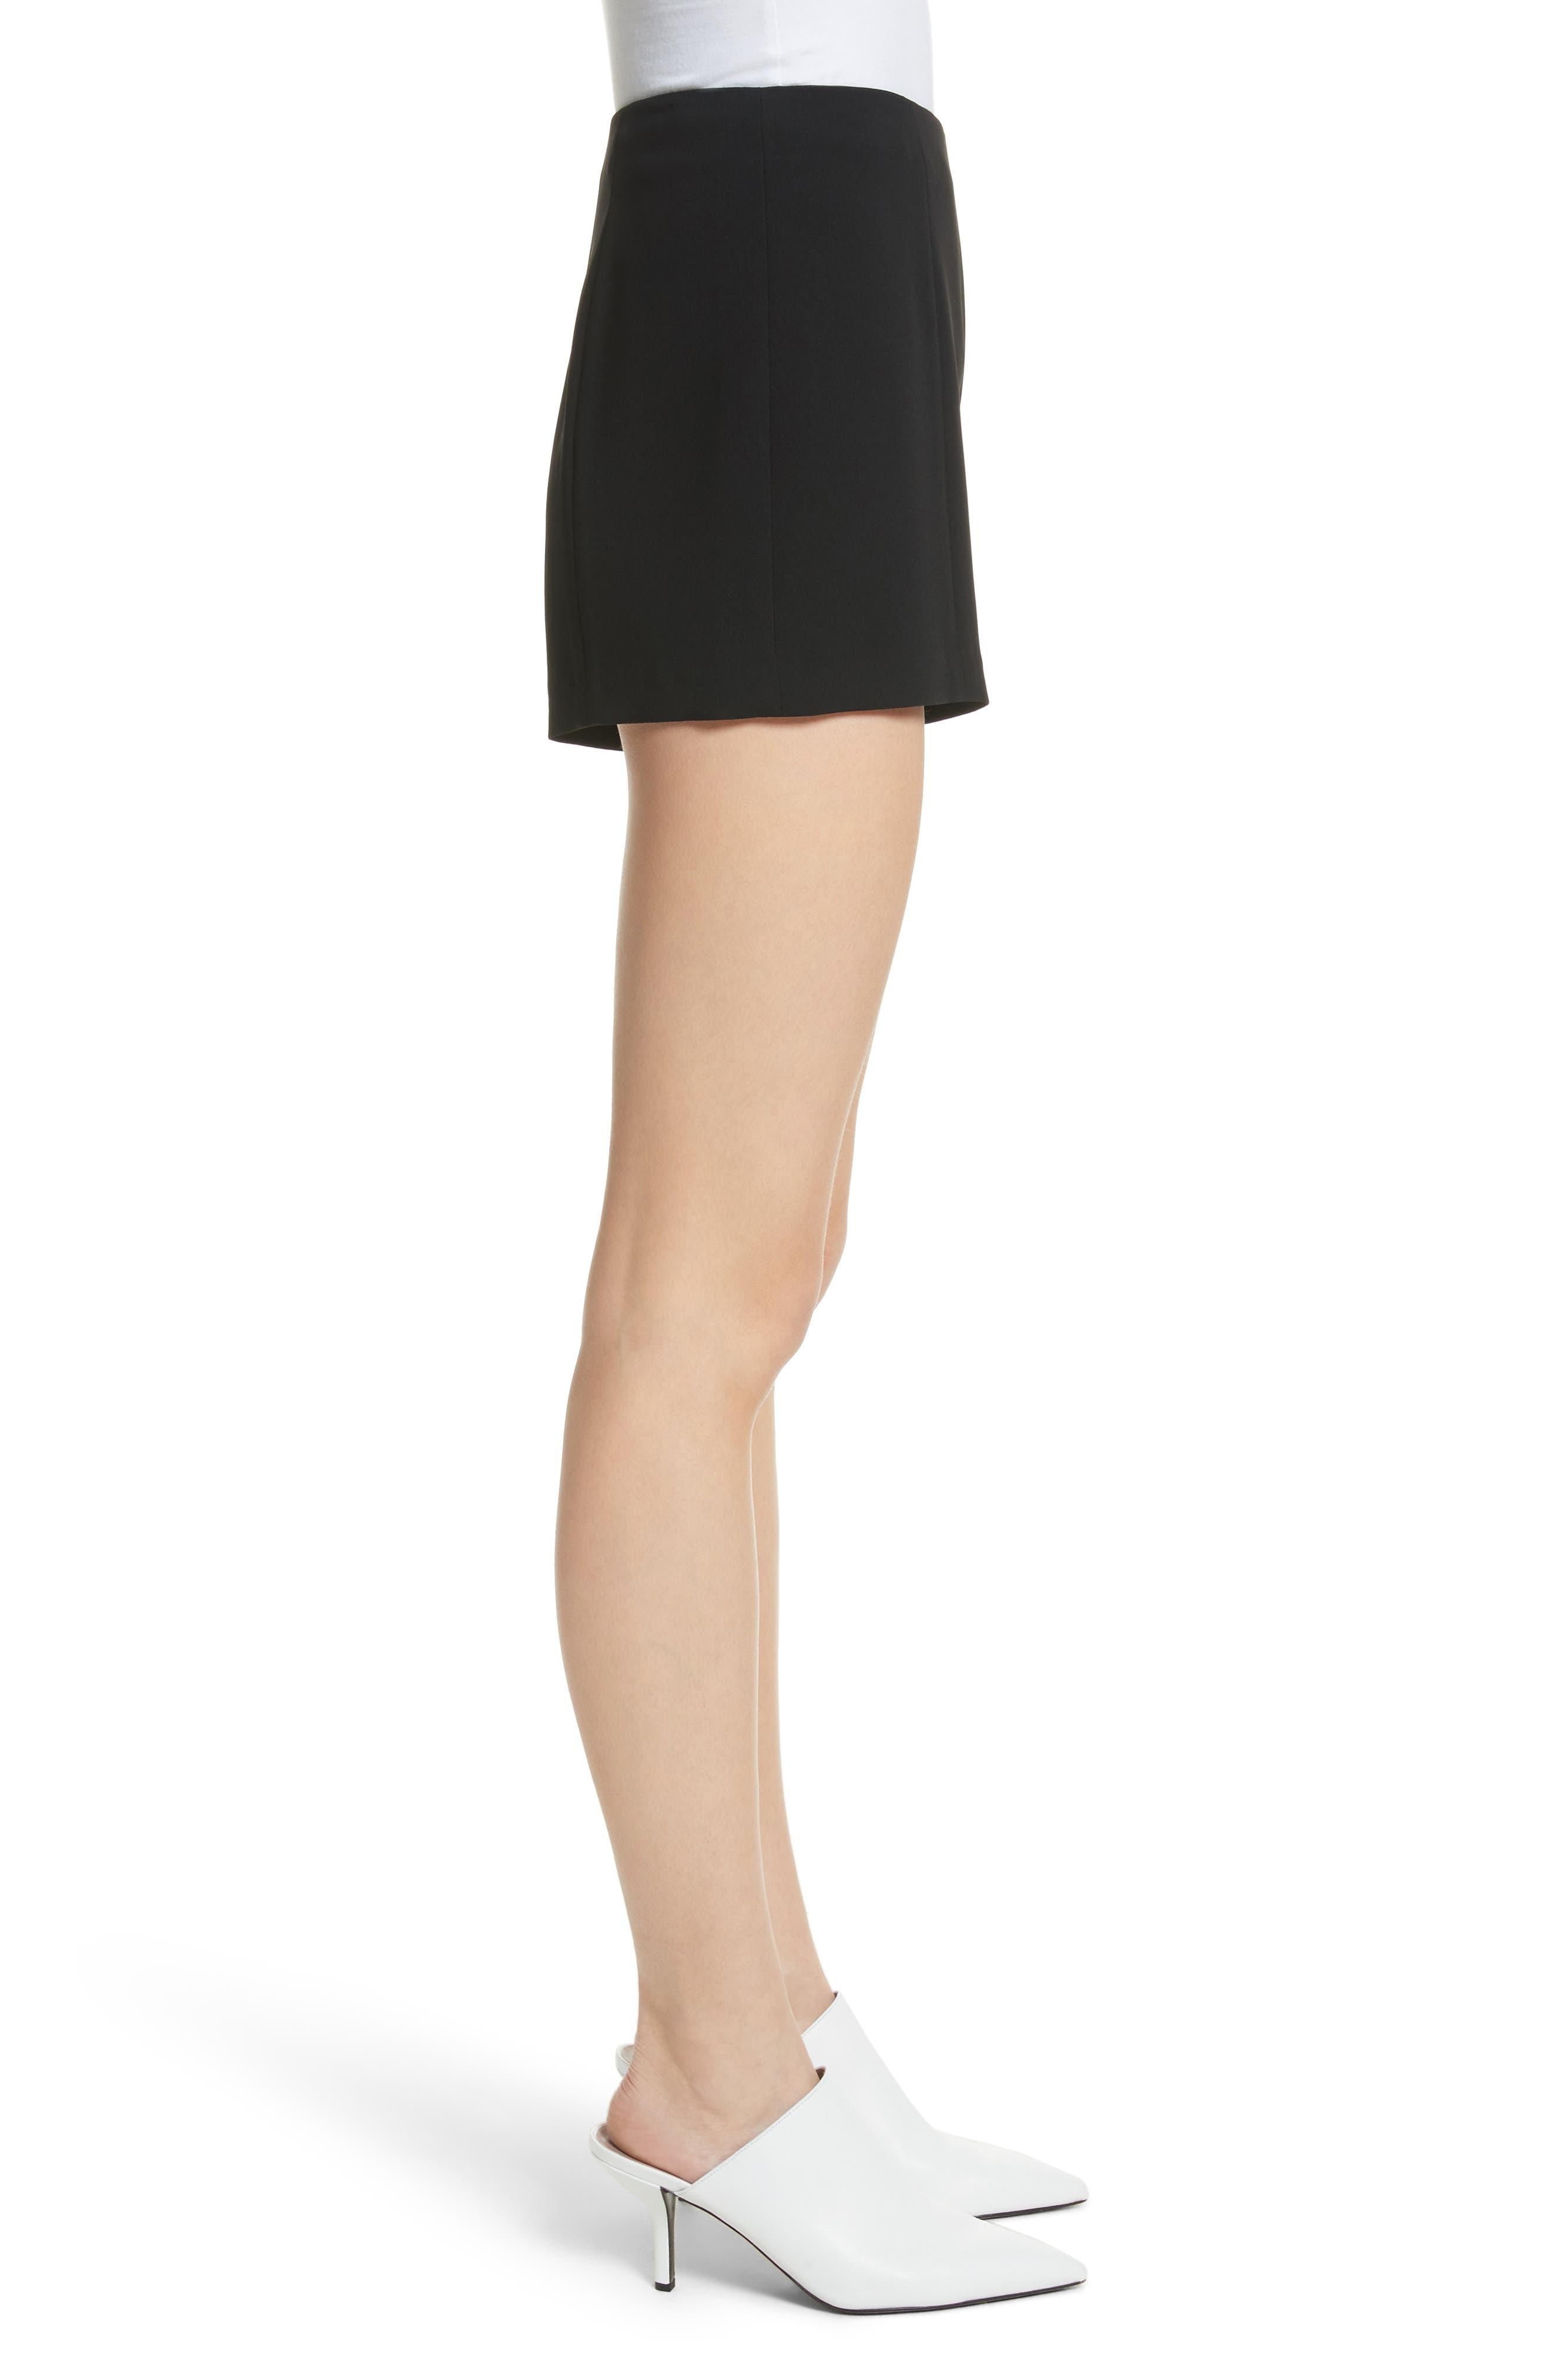 Kenzie Ruffle Side Shorts,                             Alternate thumbnail 3, color,                             001